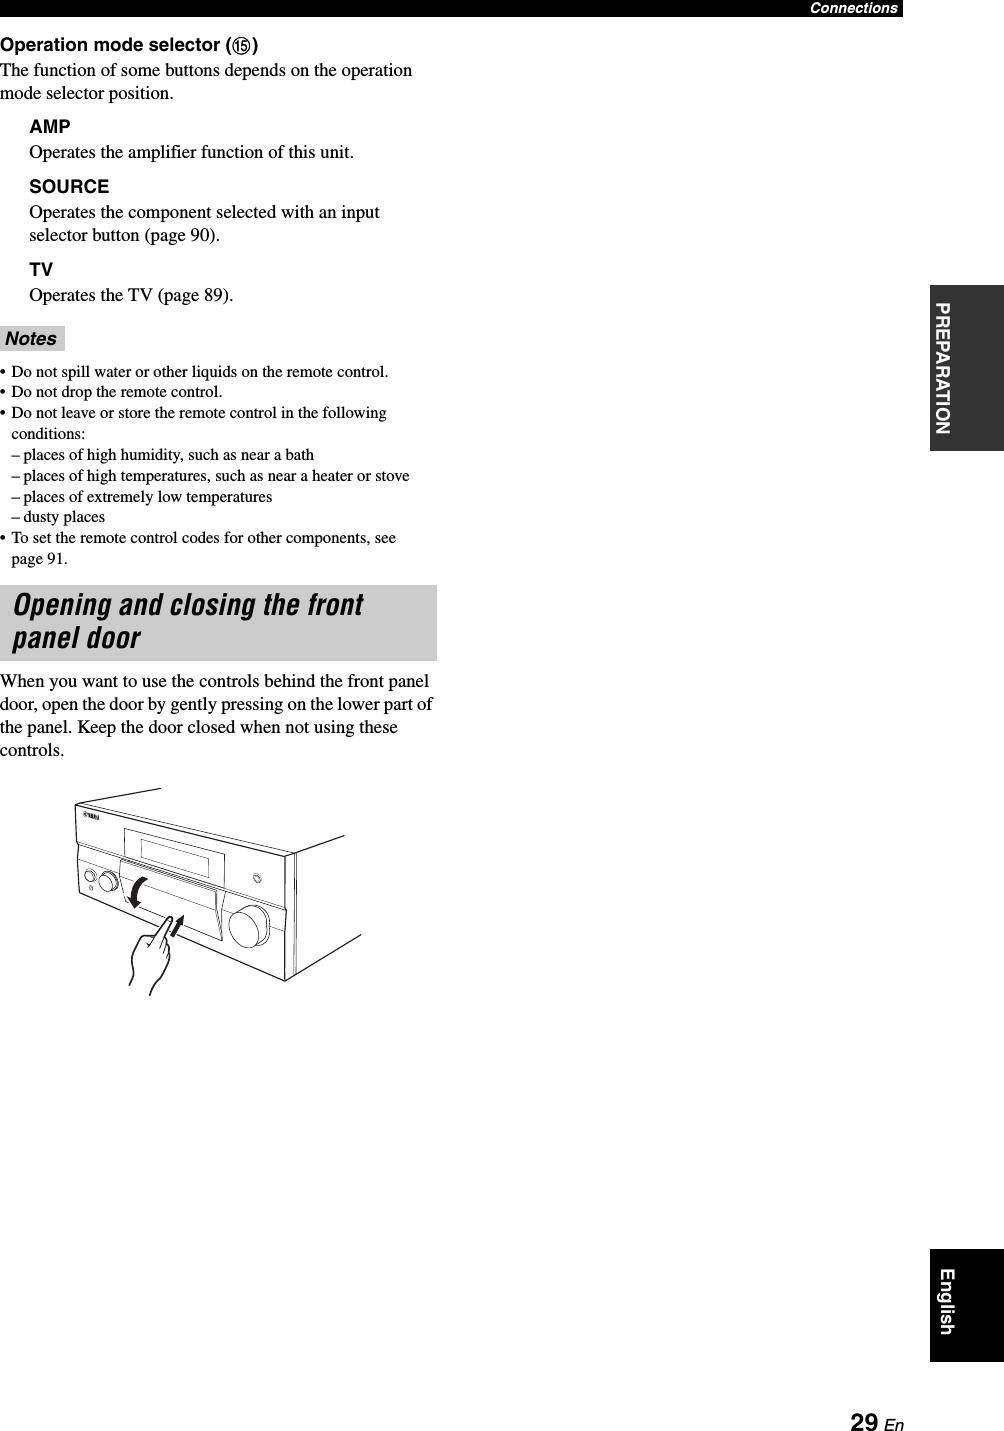 Yamaha RX V1900 Owner's Manual U